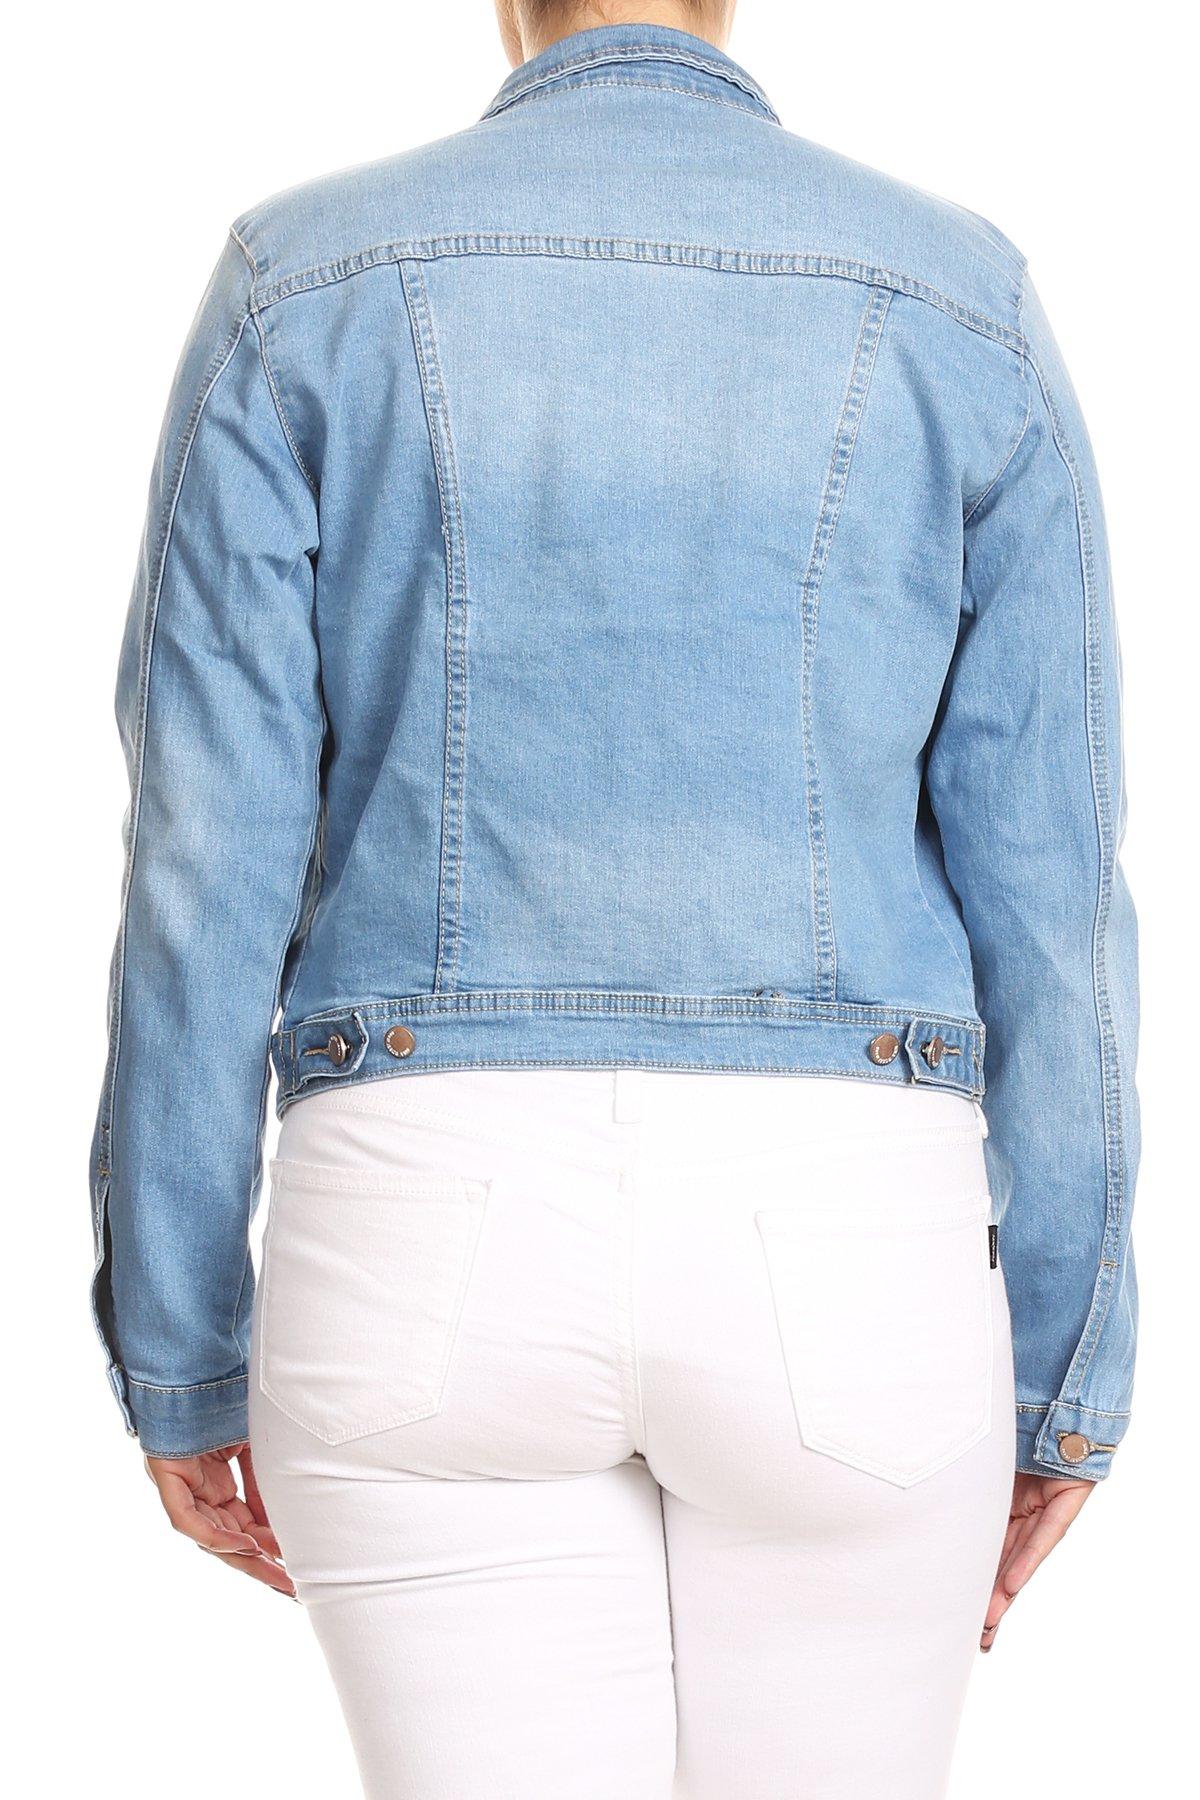 JKT102PS-Women-039-s-Plus-Size-Premium-Denim-Jackets-Long-Sleeve-Loose-Jean-Coats thumbnail 9